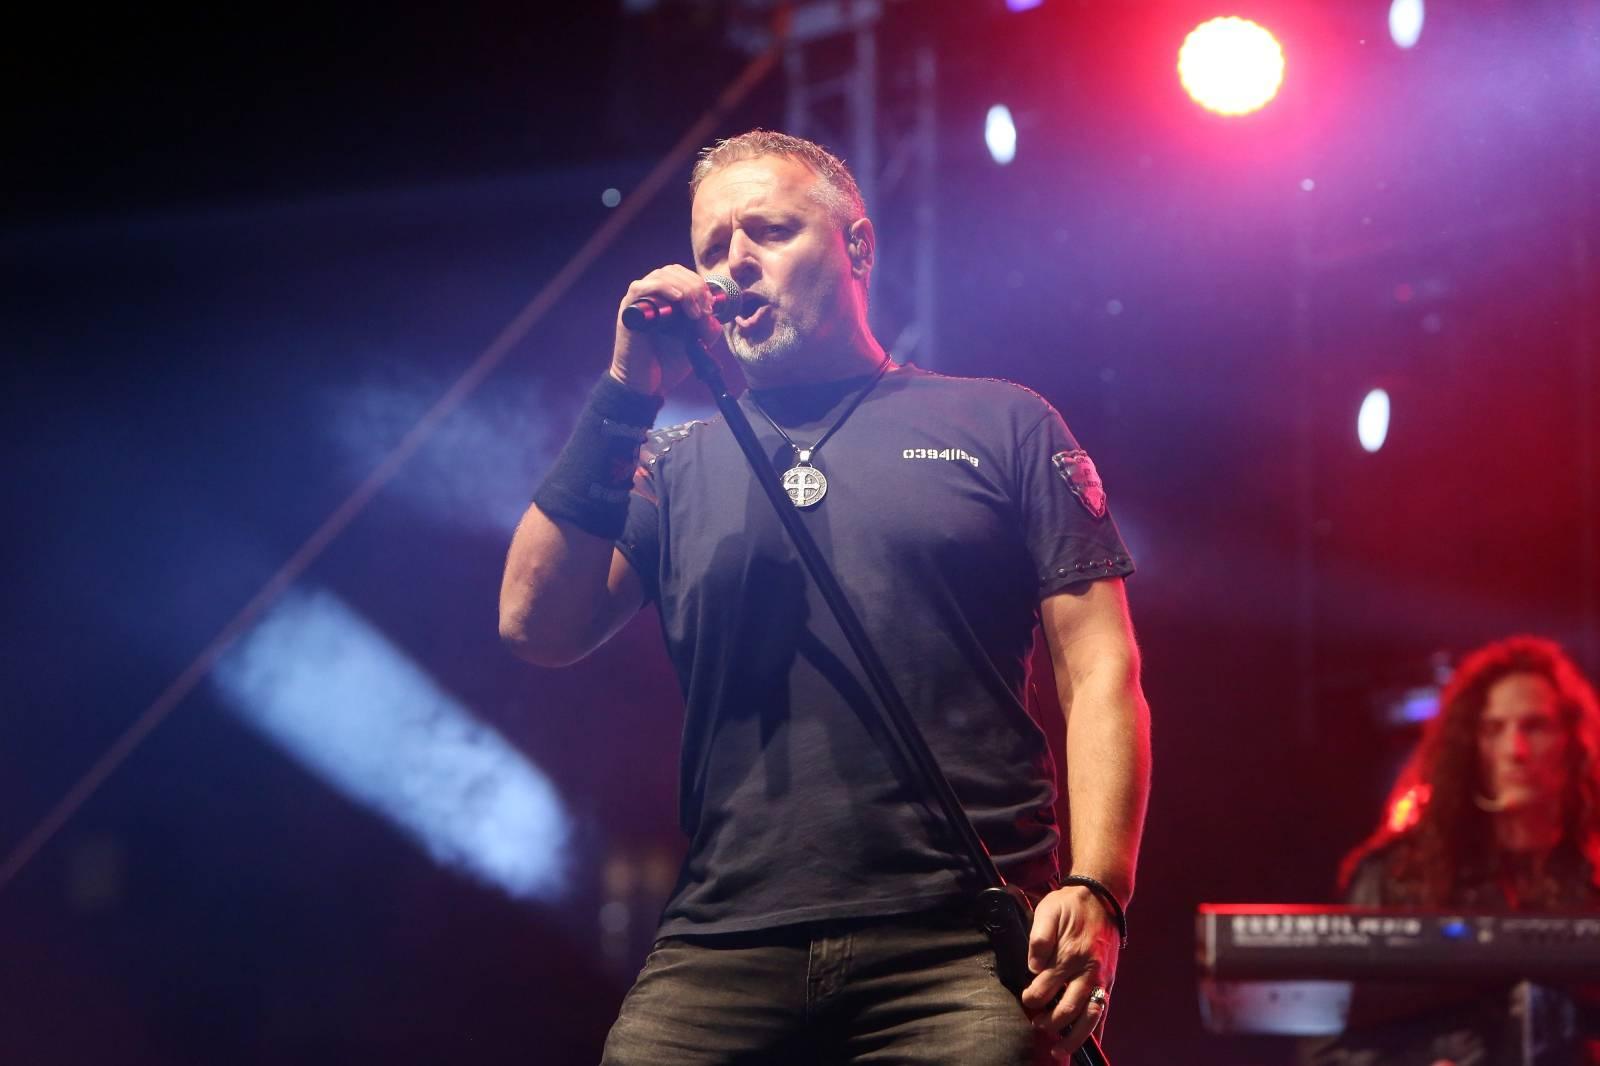 Duga Resa: Koncert Marka Perkovića Thompsona na stadionu NK Duga Resa